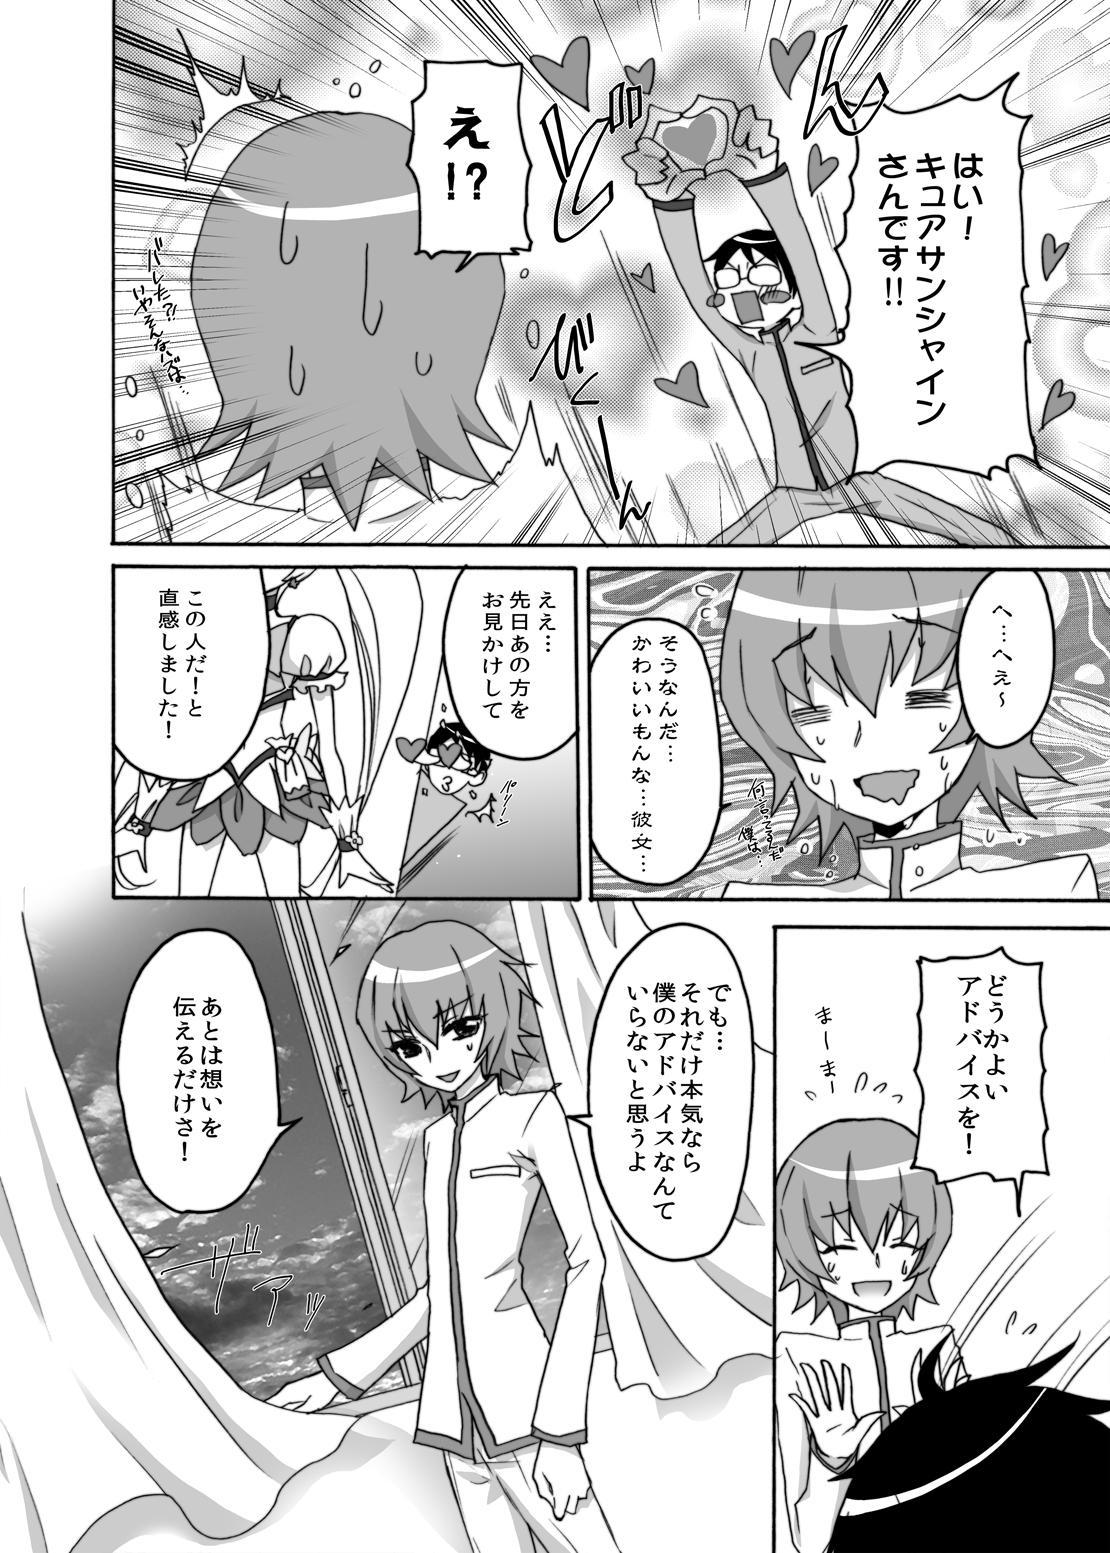 Kyoudake Kanojo Sunshine 4